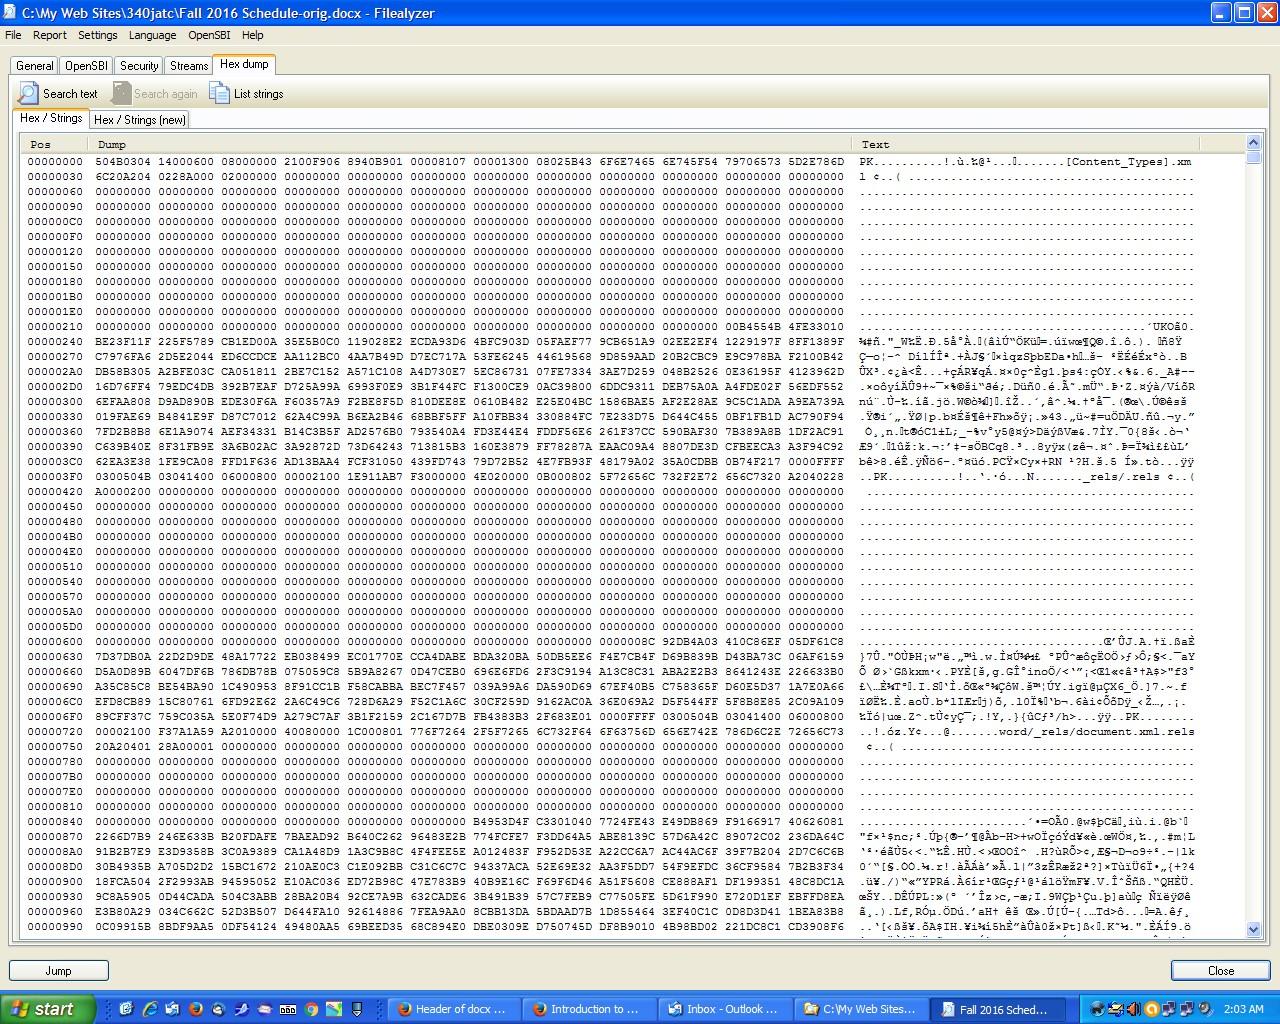 Header of docx file